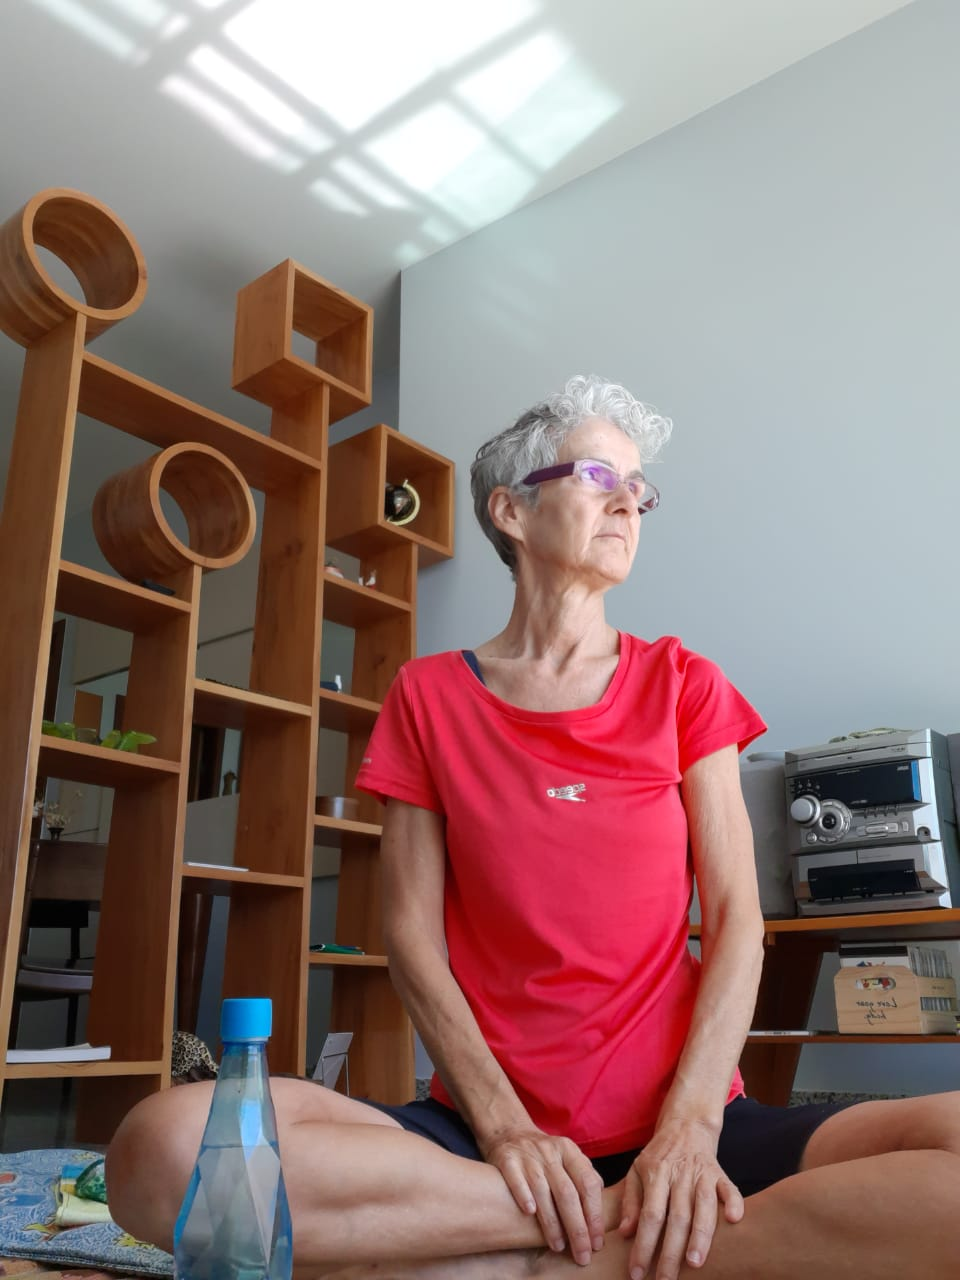 Cristina Flores Garcia, 61